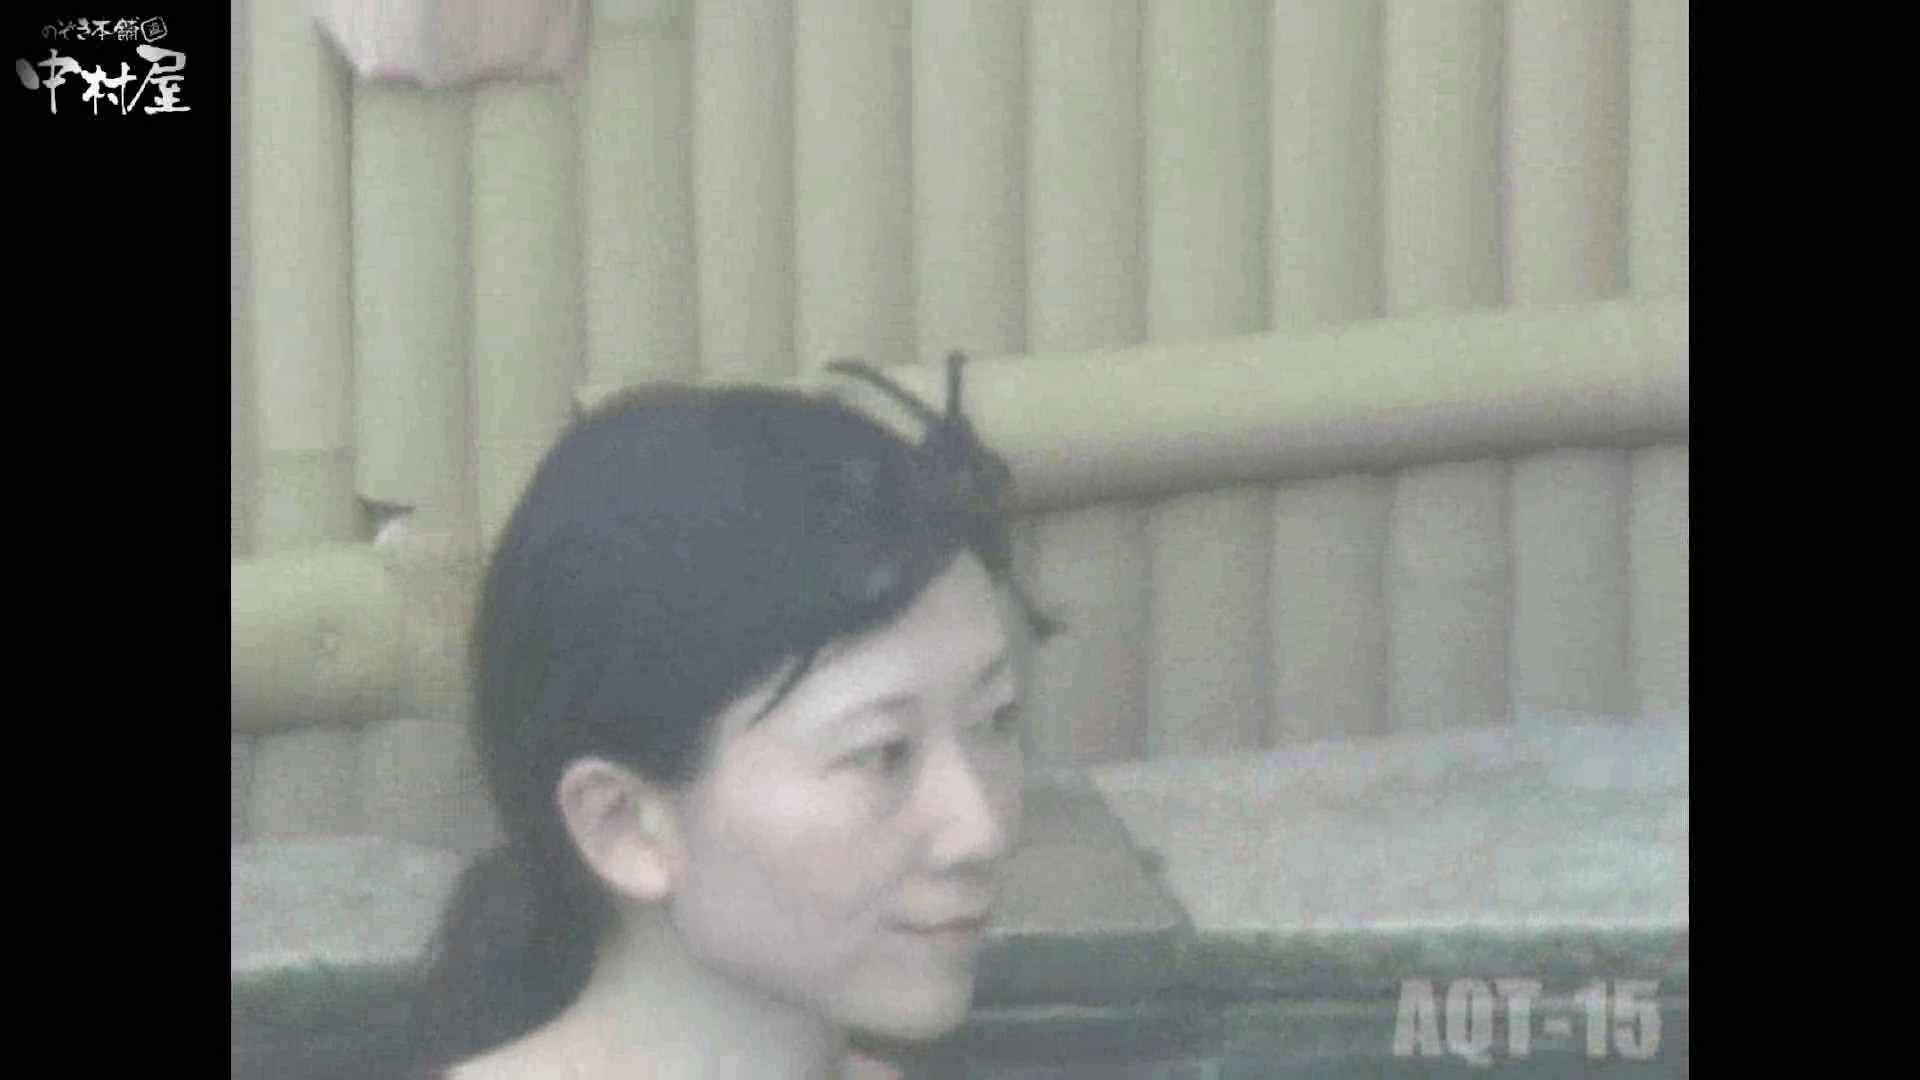 Aquaな露天風呂Vol.878潜入盗撮露天風呂十五判湯 其の五 露天風呂編  112PIX 39